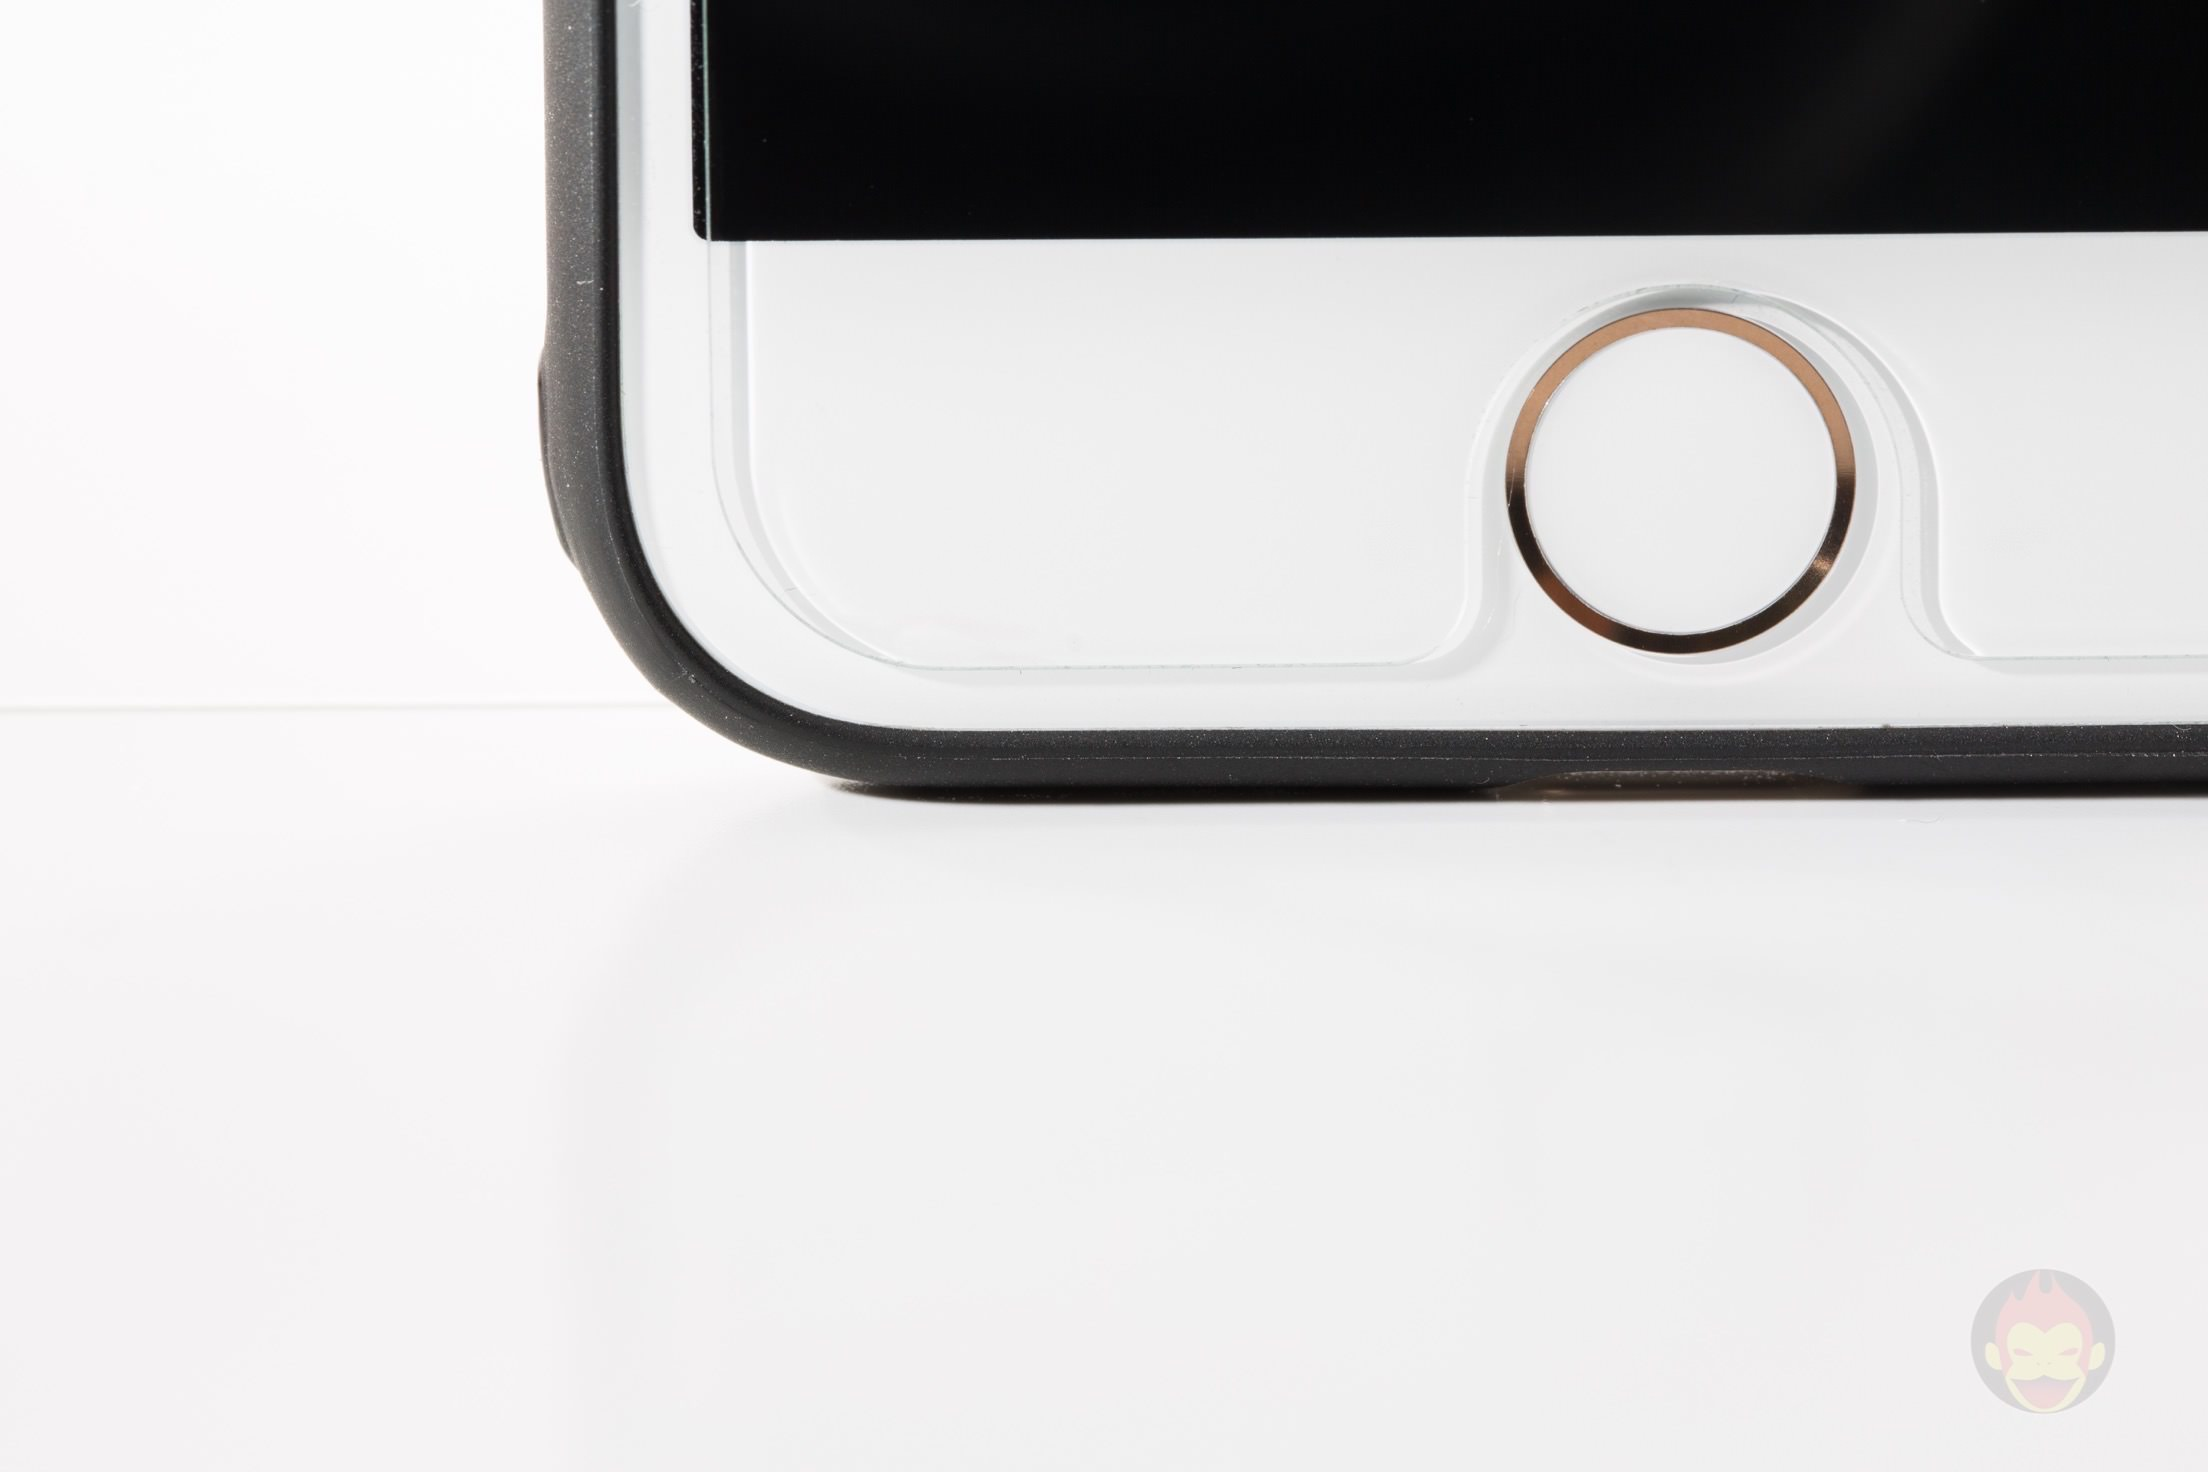 iPhone-7-Gold-Model-03.jpg